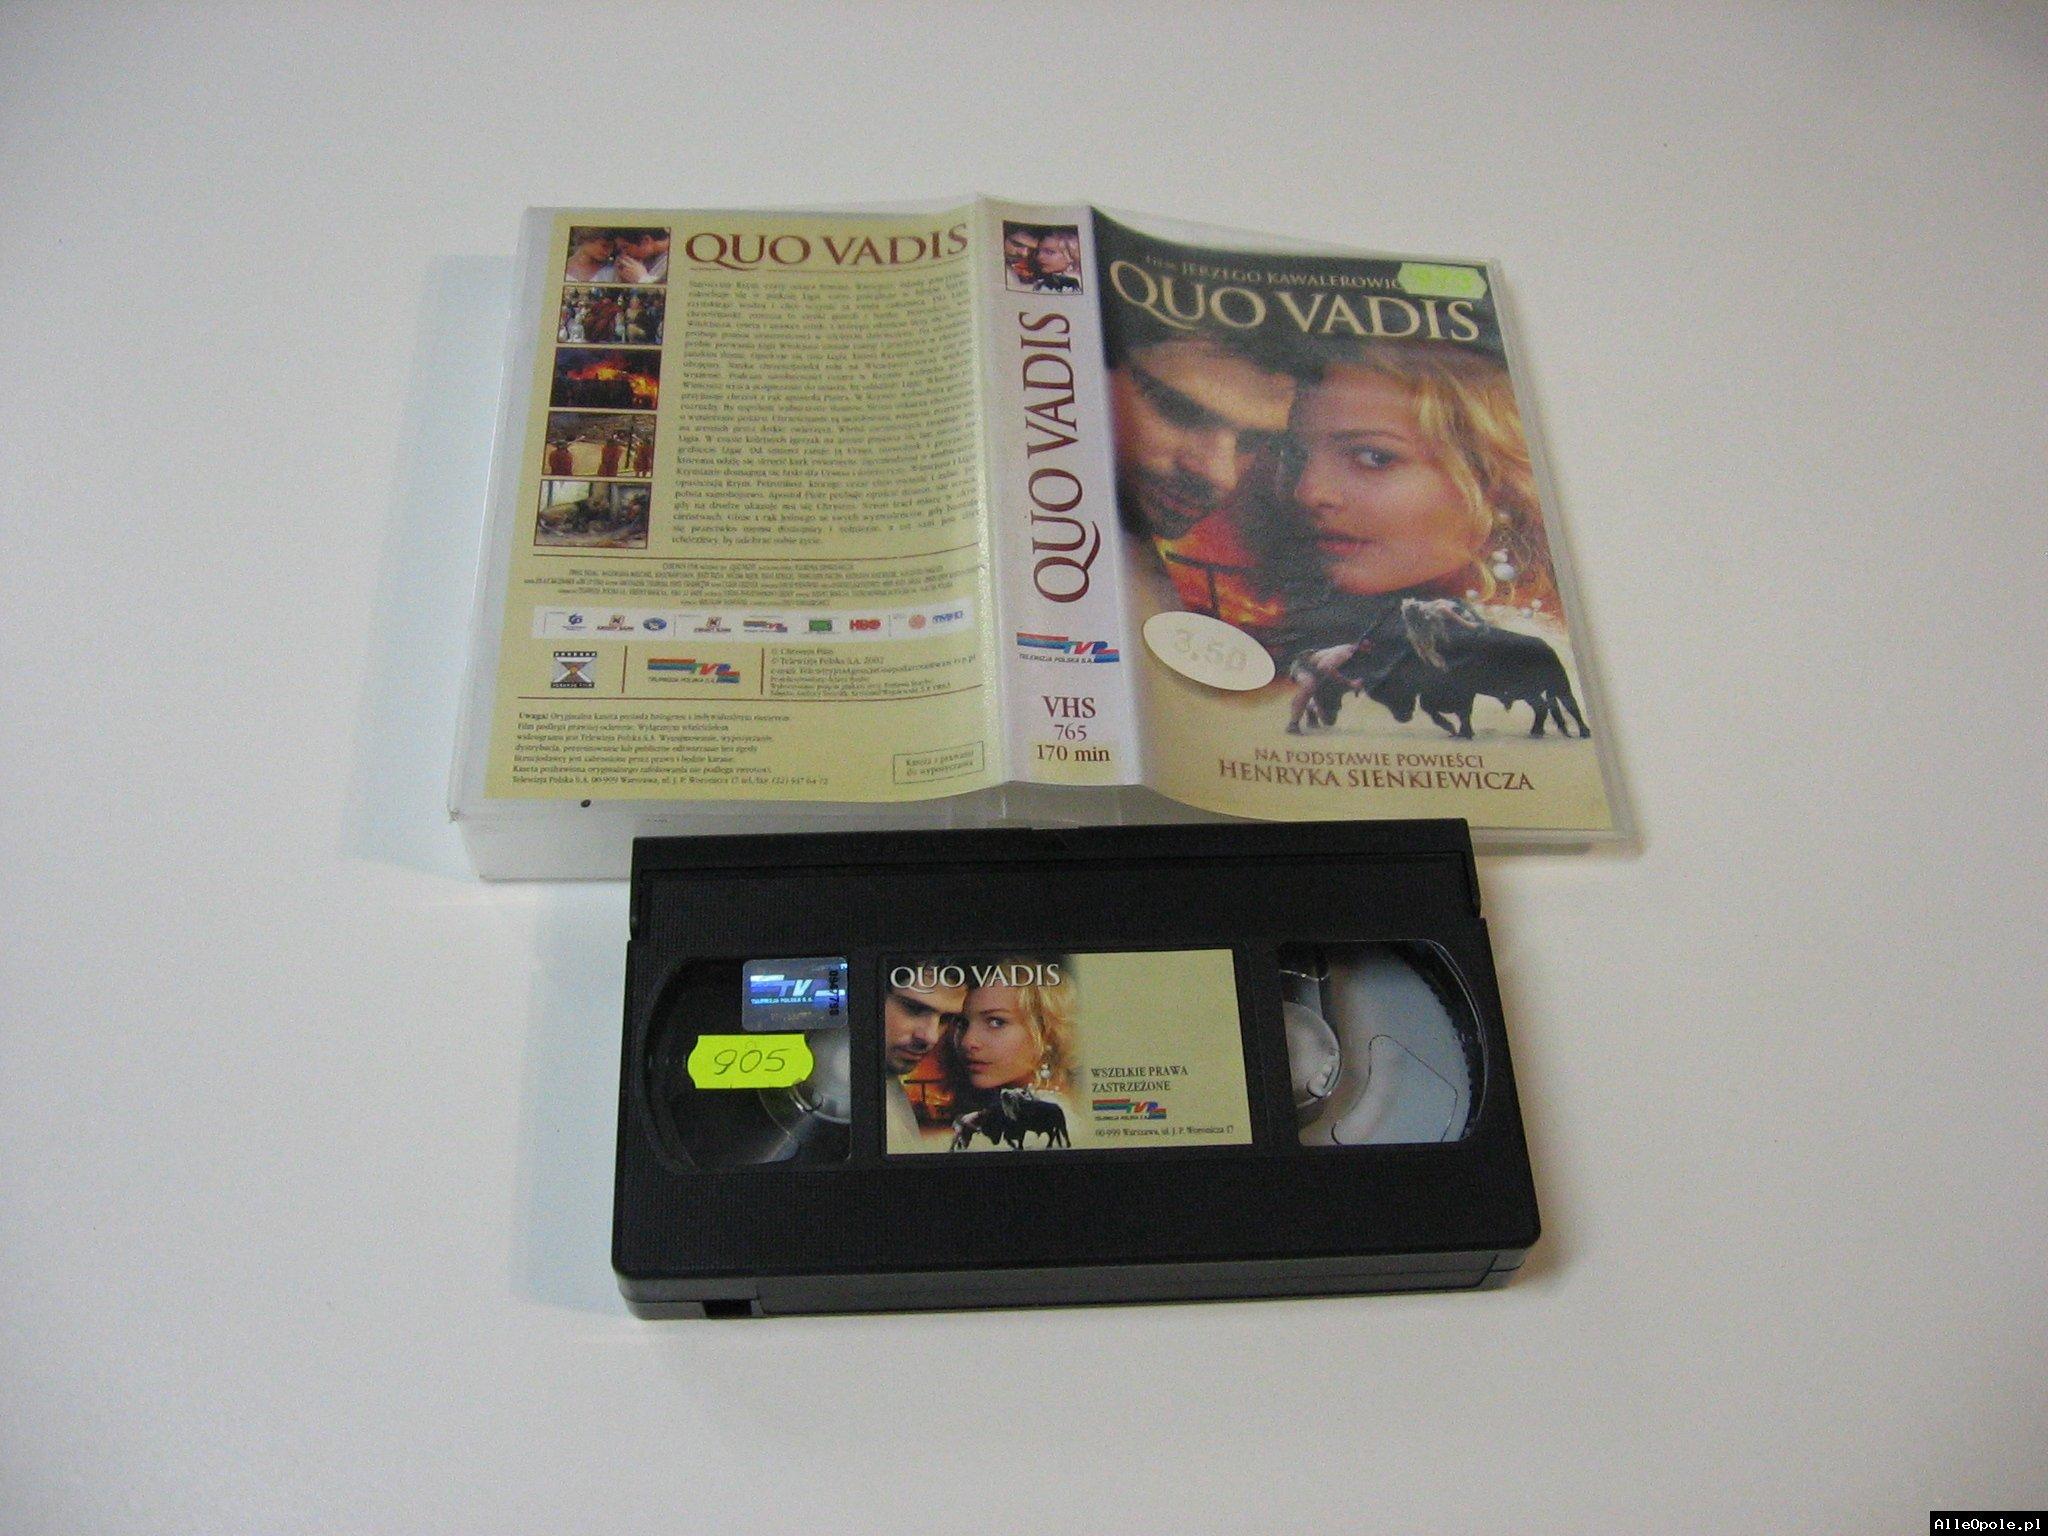 QUO VADIS - VHS Kaseta Video - Opole 1764